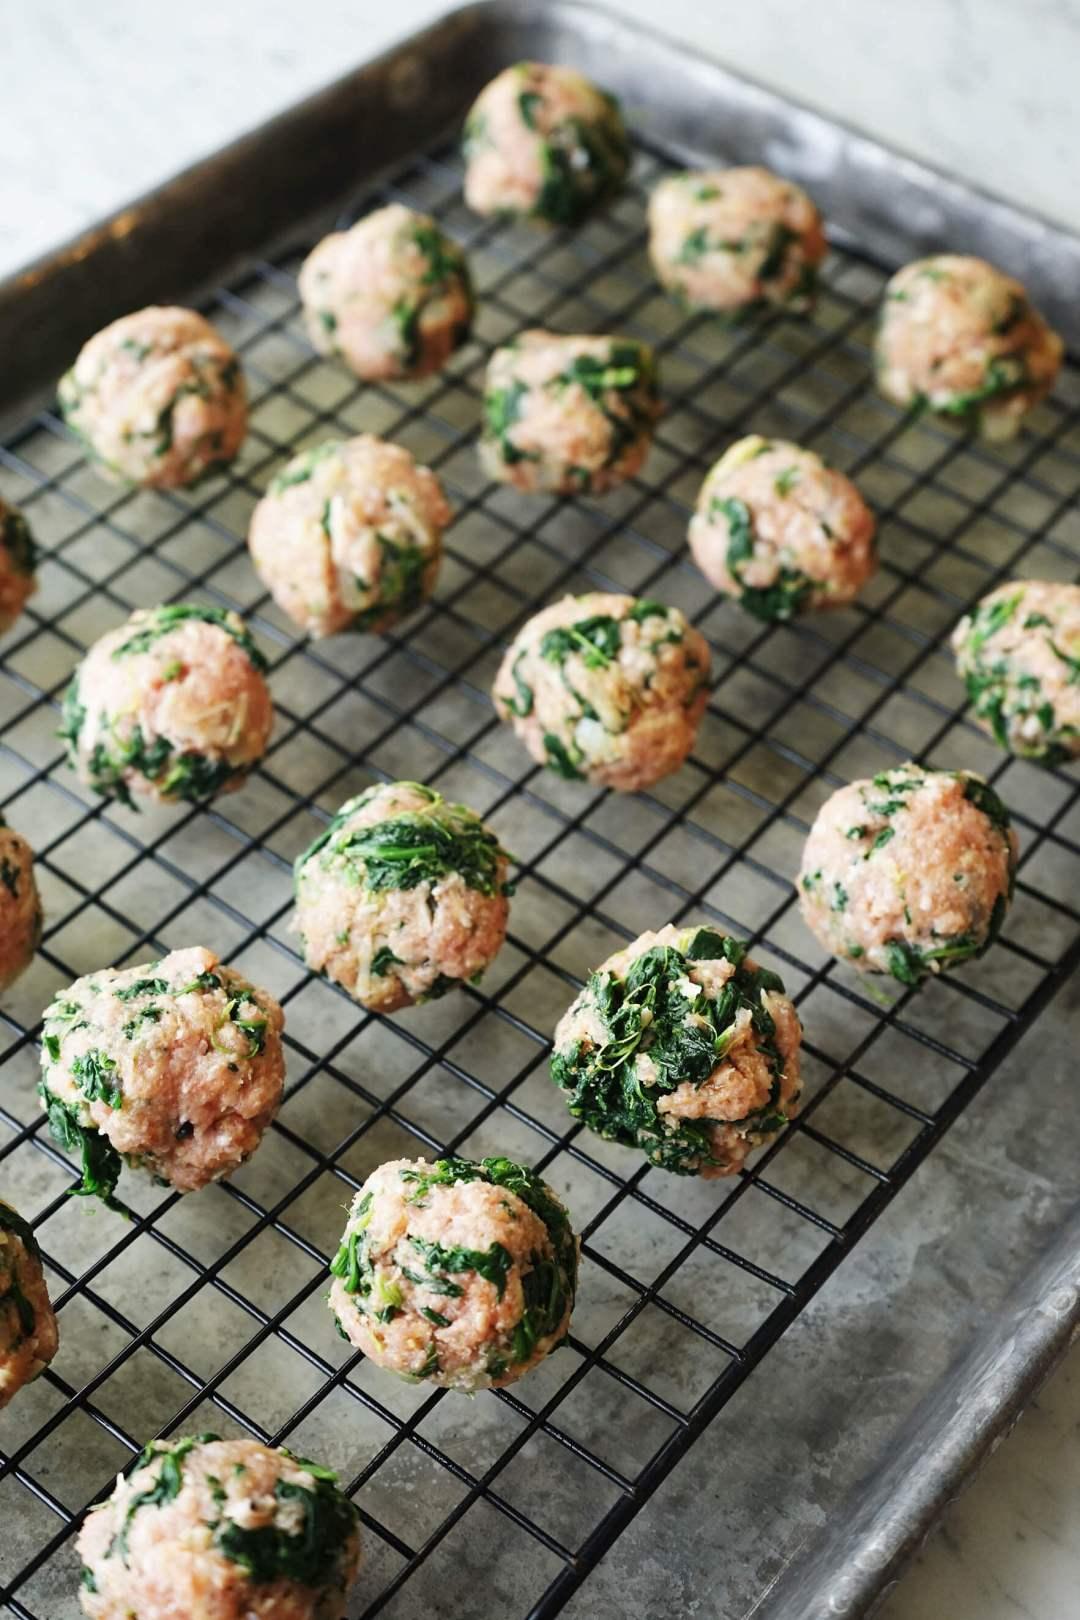 Shape into meatballs.